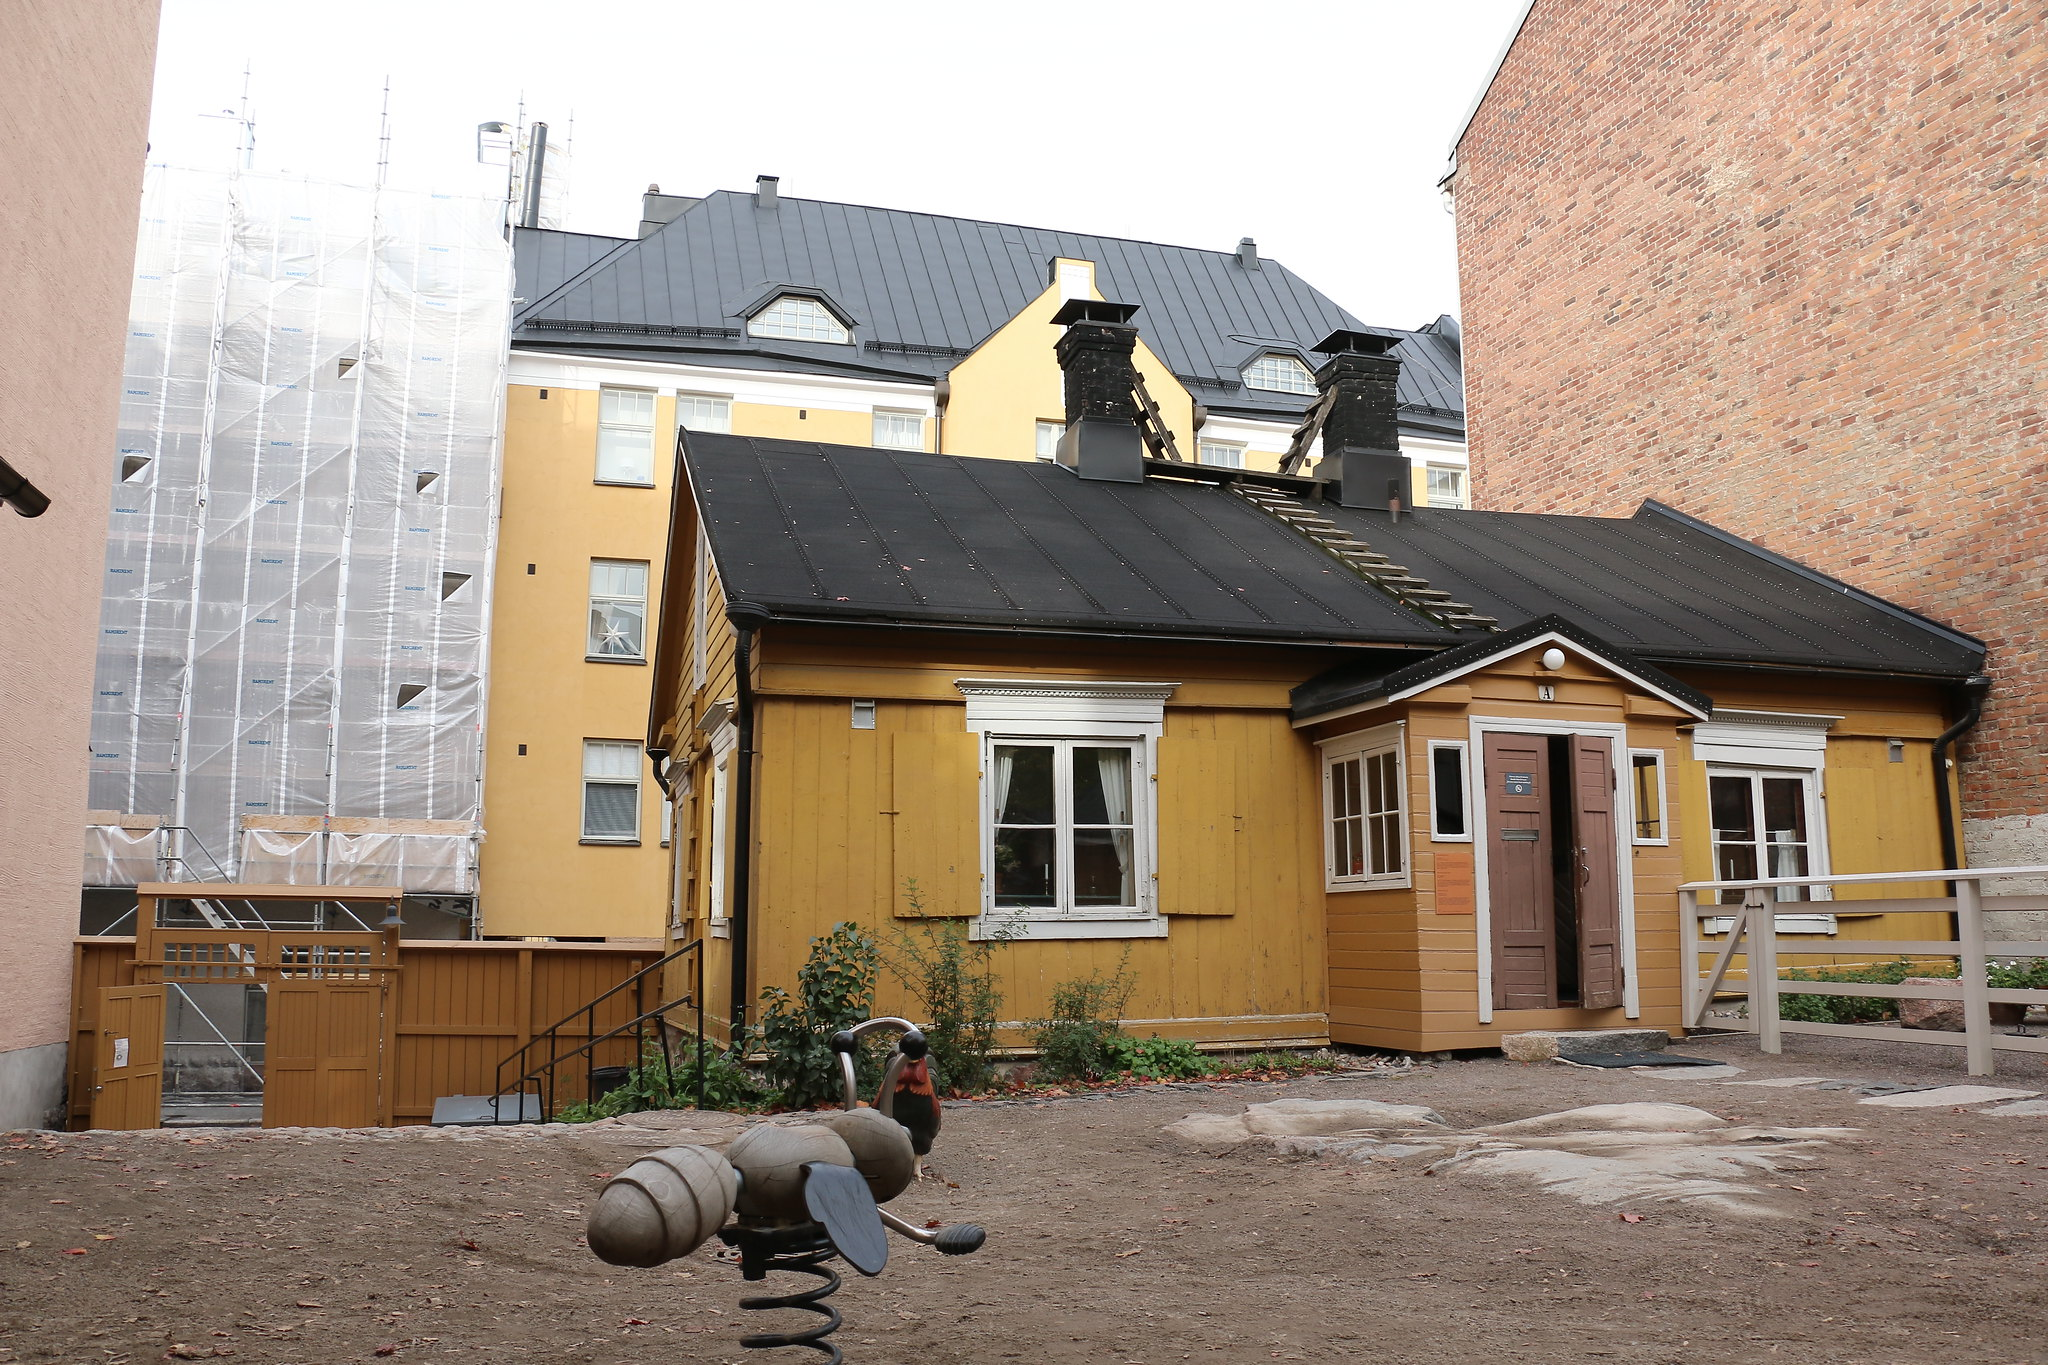 Helsinki_okt18_394